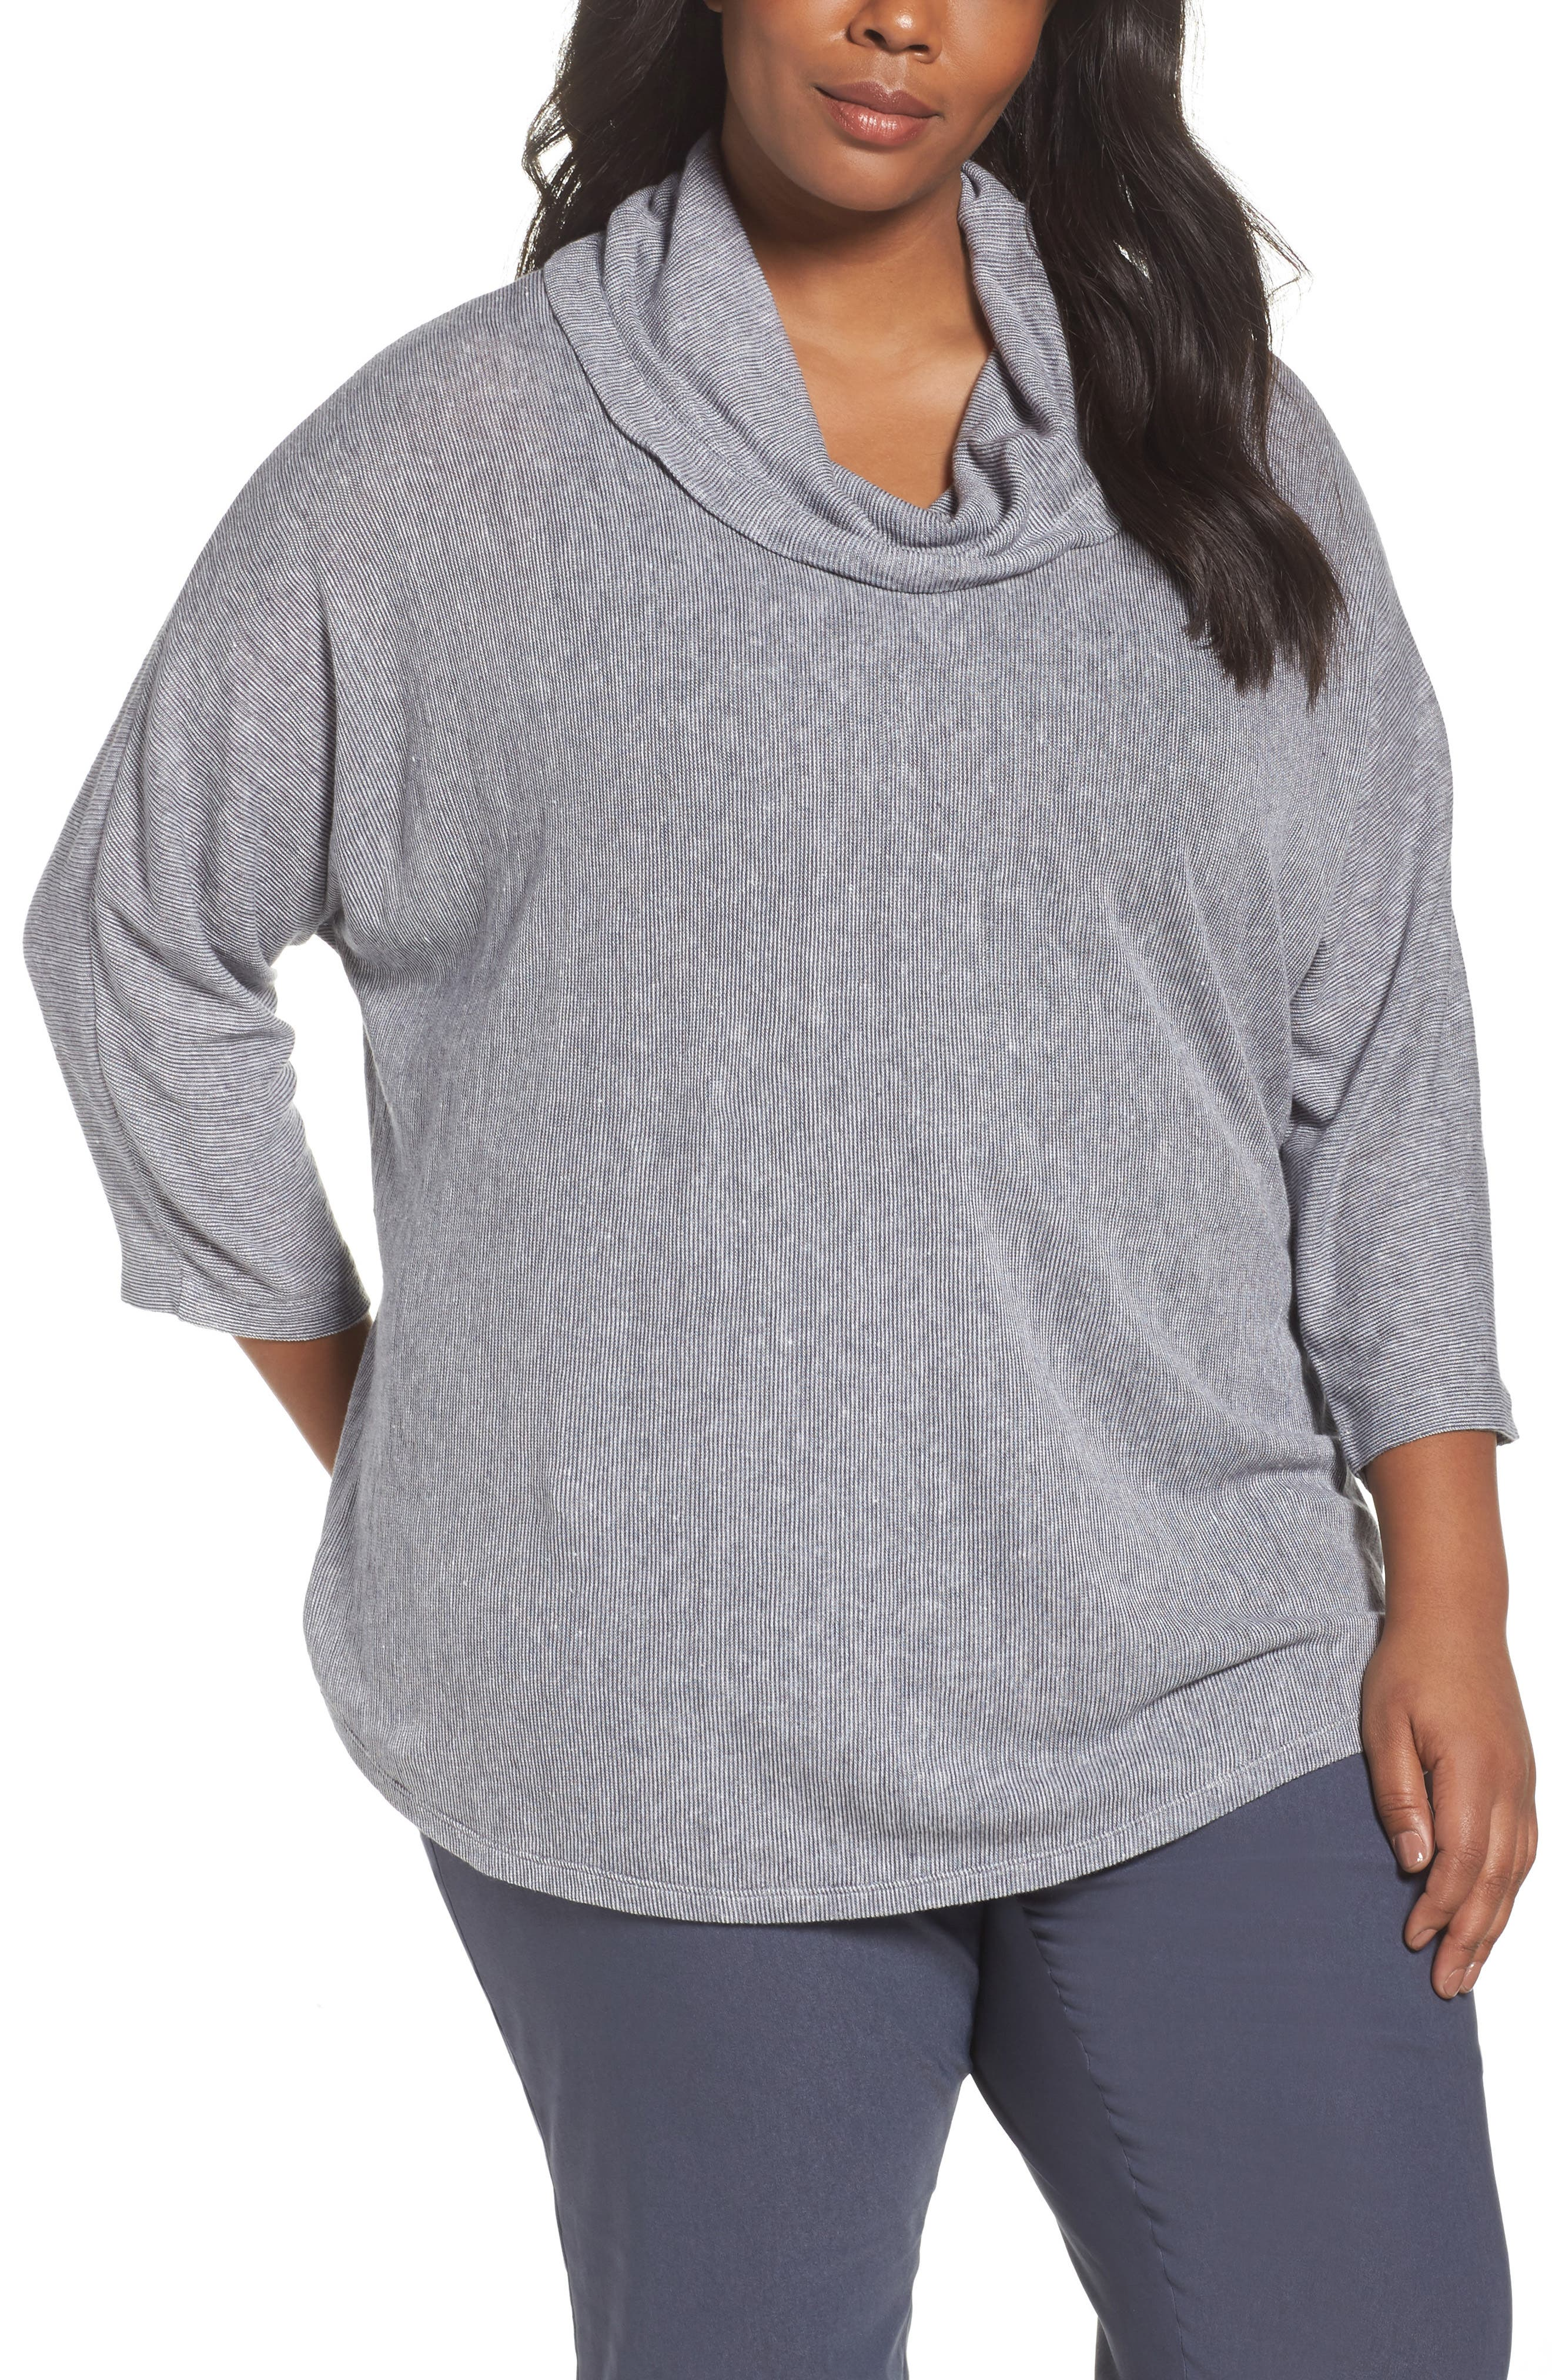 Main Image - NIC+ZOE Blissful Cowl Neck Top (Plus Size)